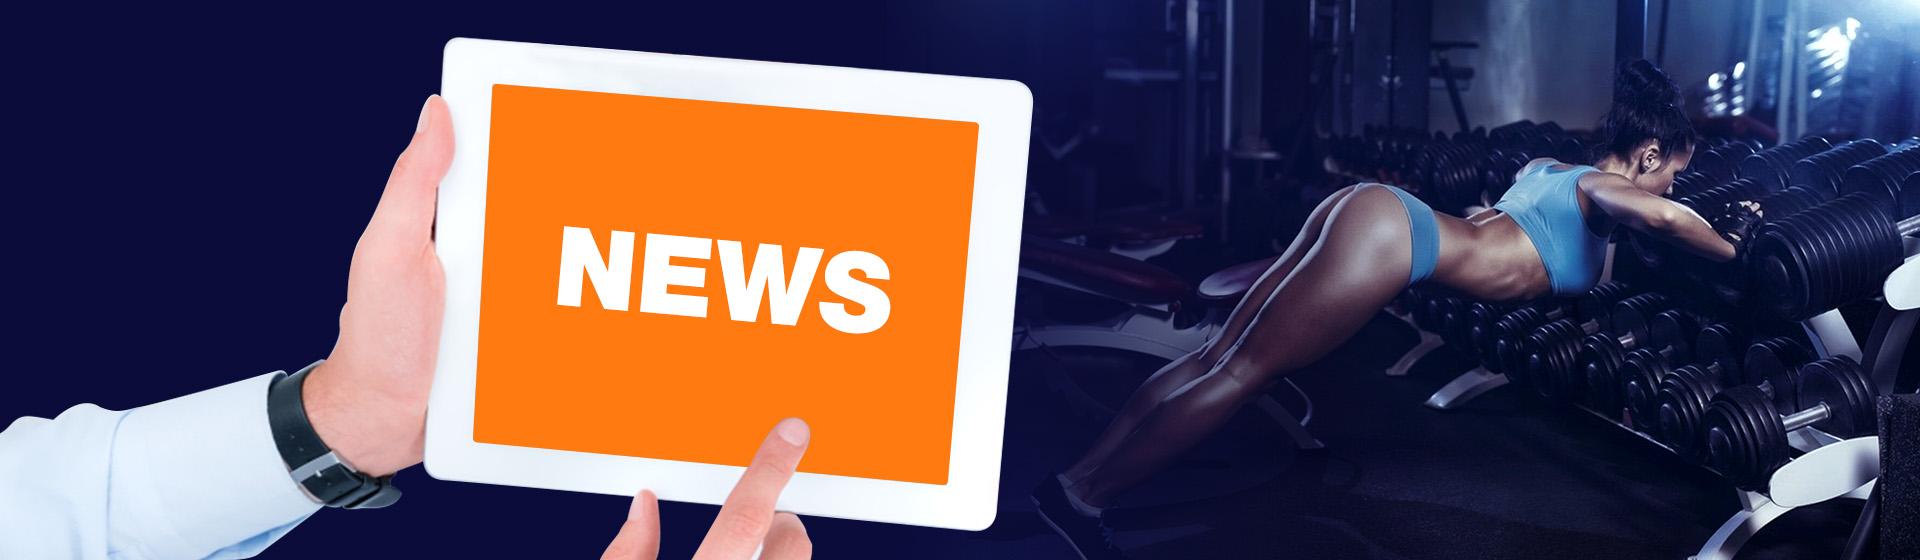 news-wholesale sportswear-custom apparel- clothing manufacturing companies-Ruiteng-img